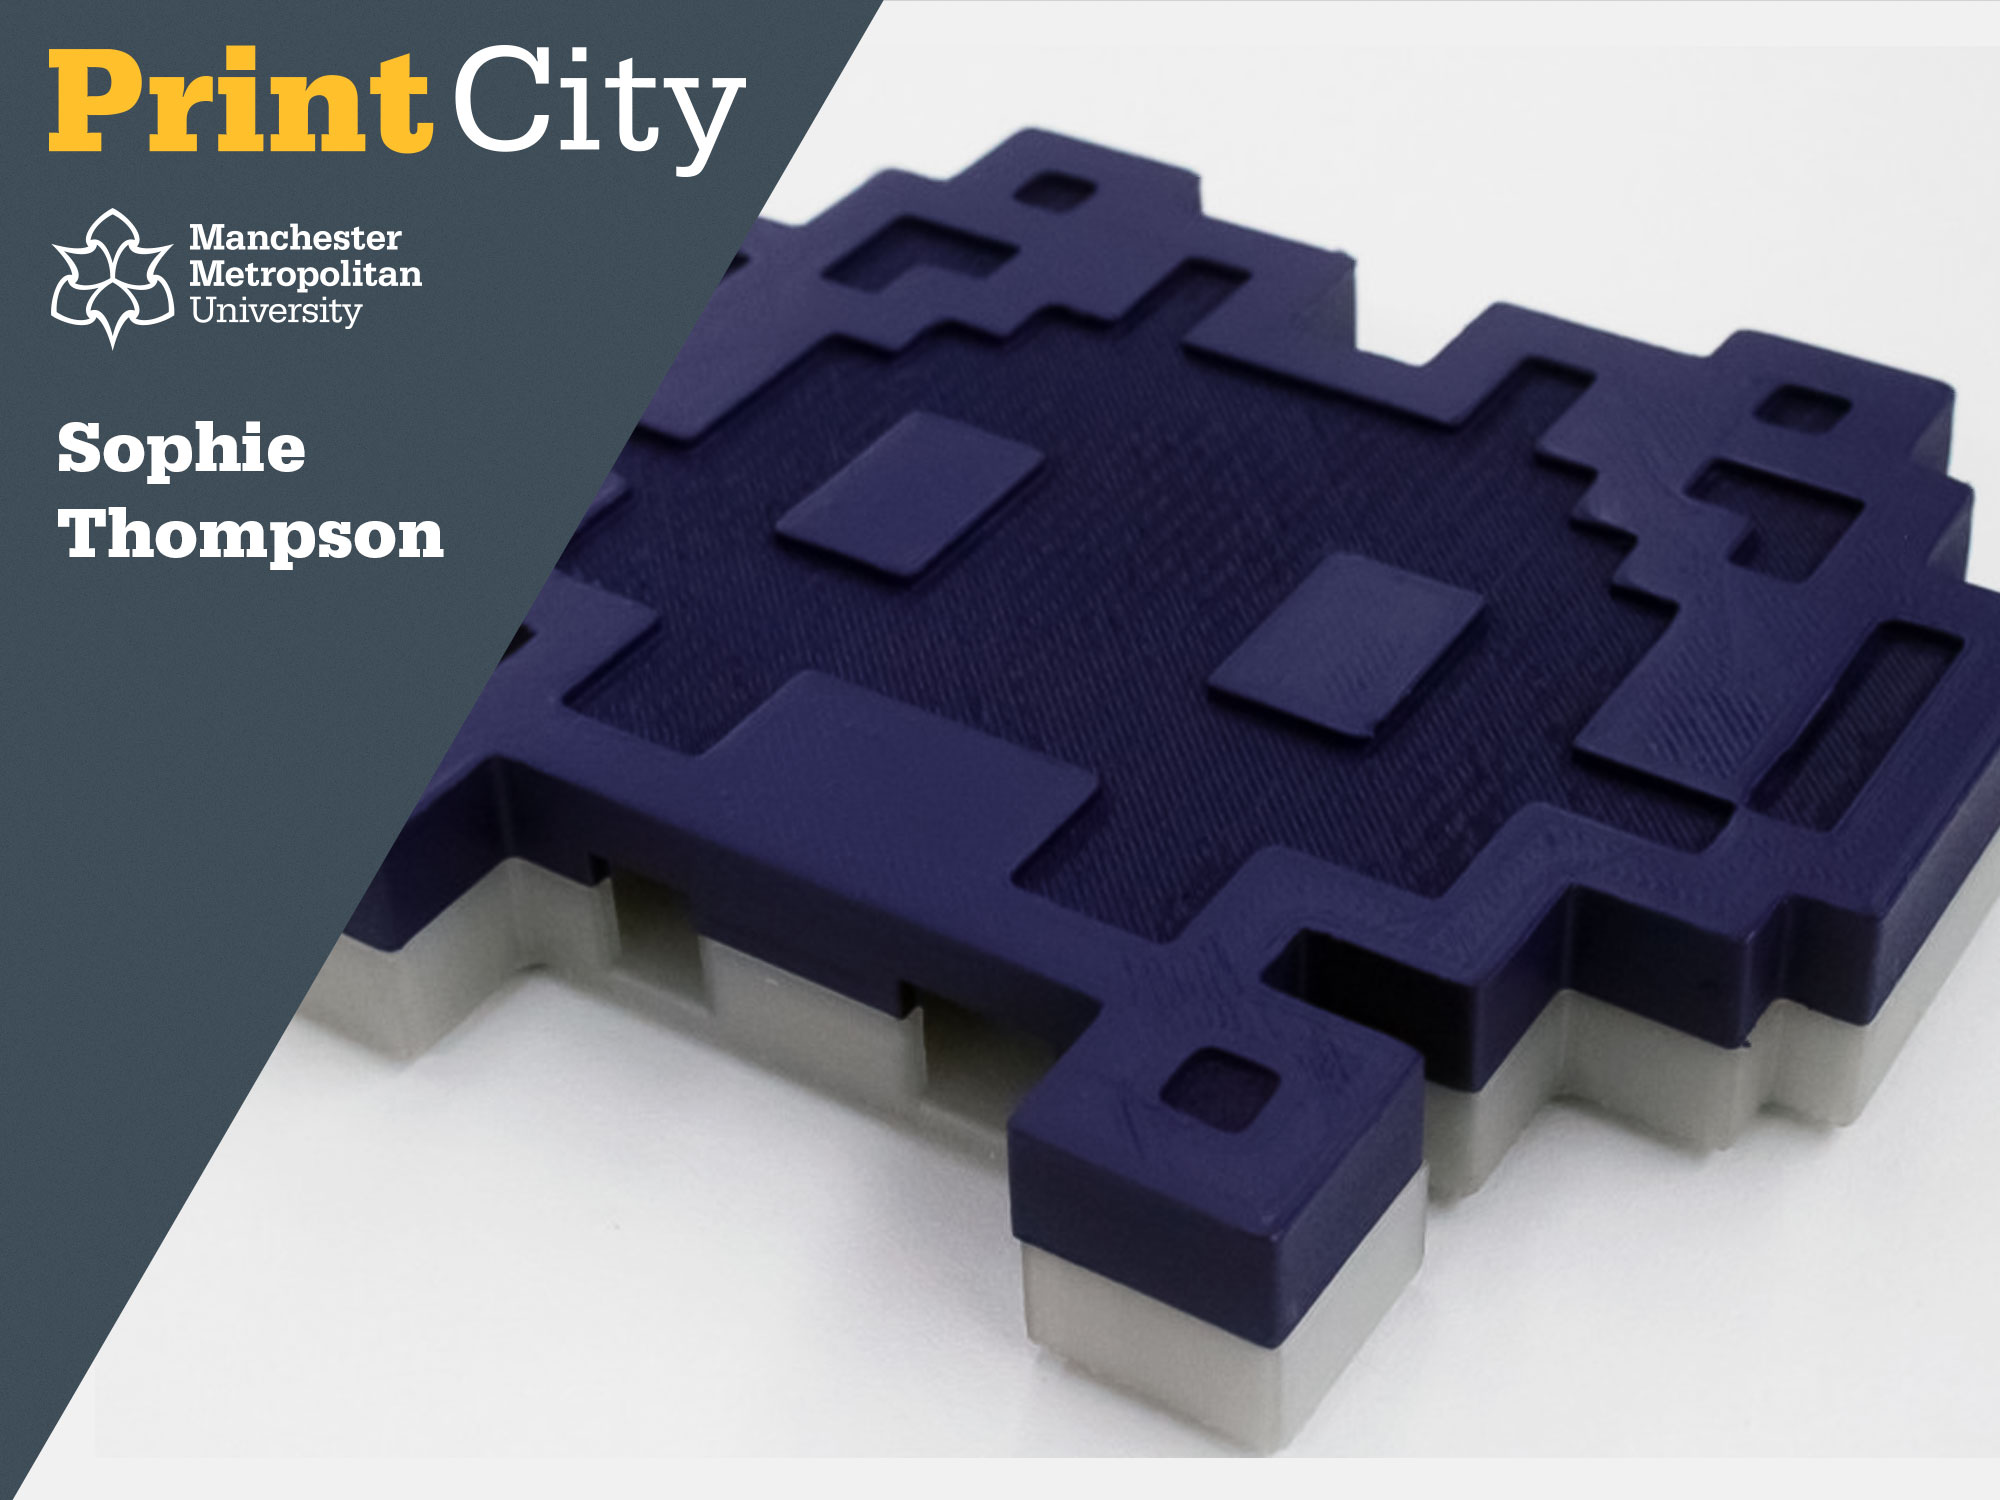 Sophie Thompson - Student Profile - PrintCity - Manchester Metropolitan University